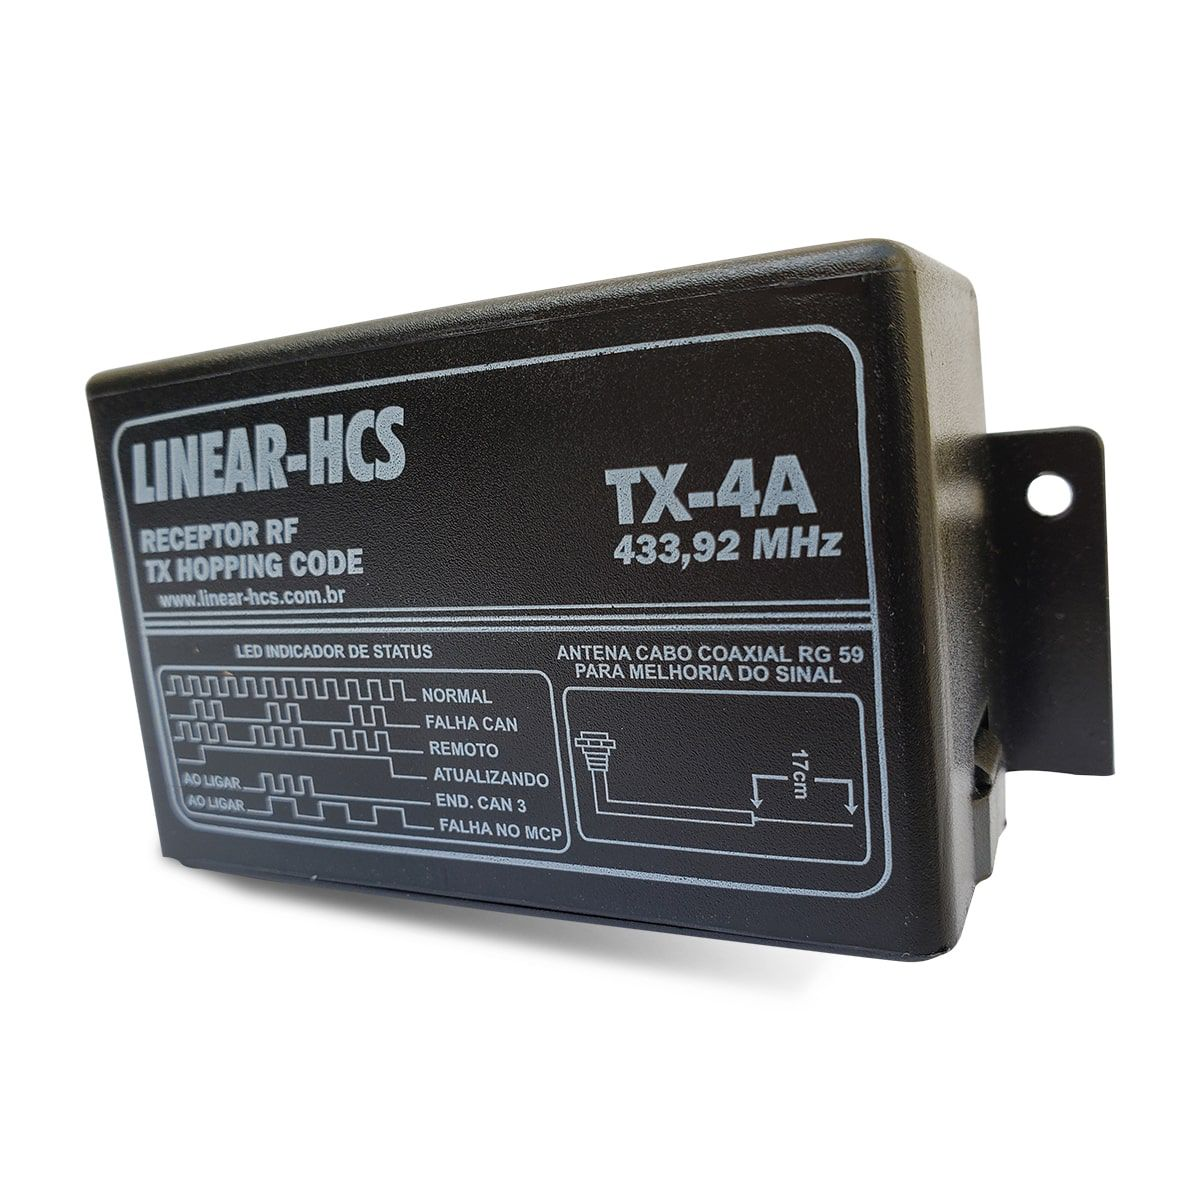 Receptor Linear-HCS TX-4A  - CFTV Clube | Brasil